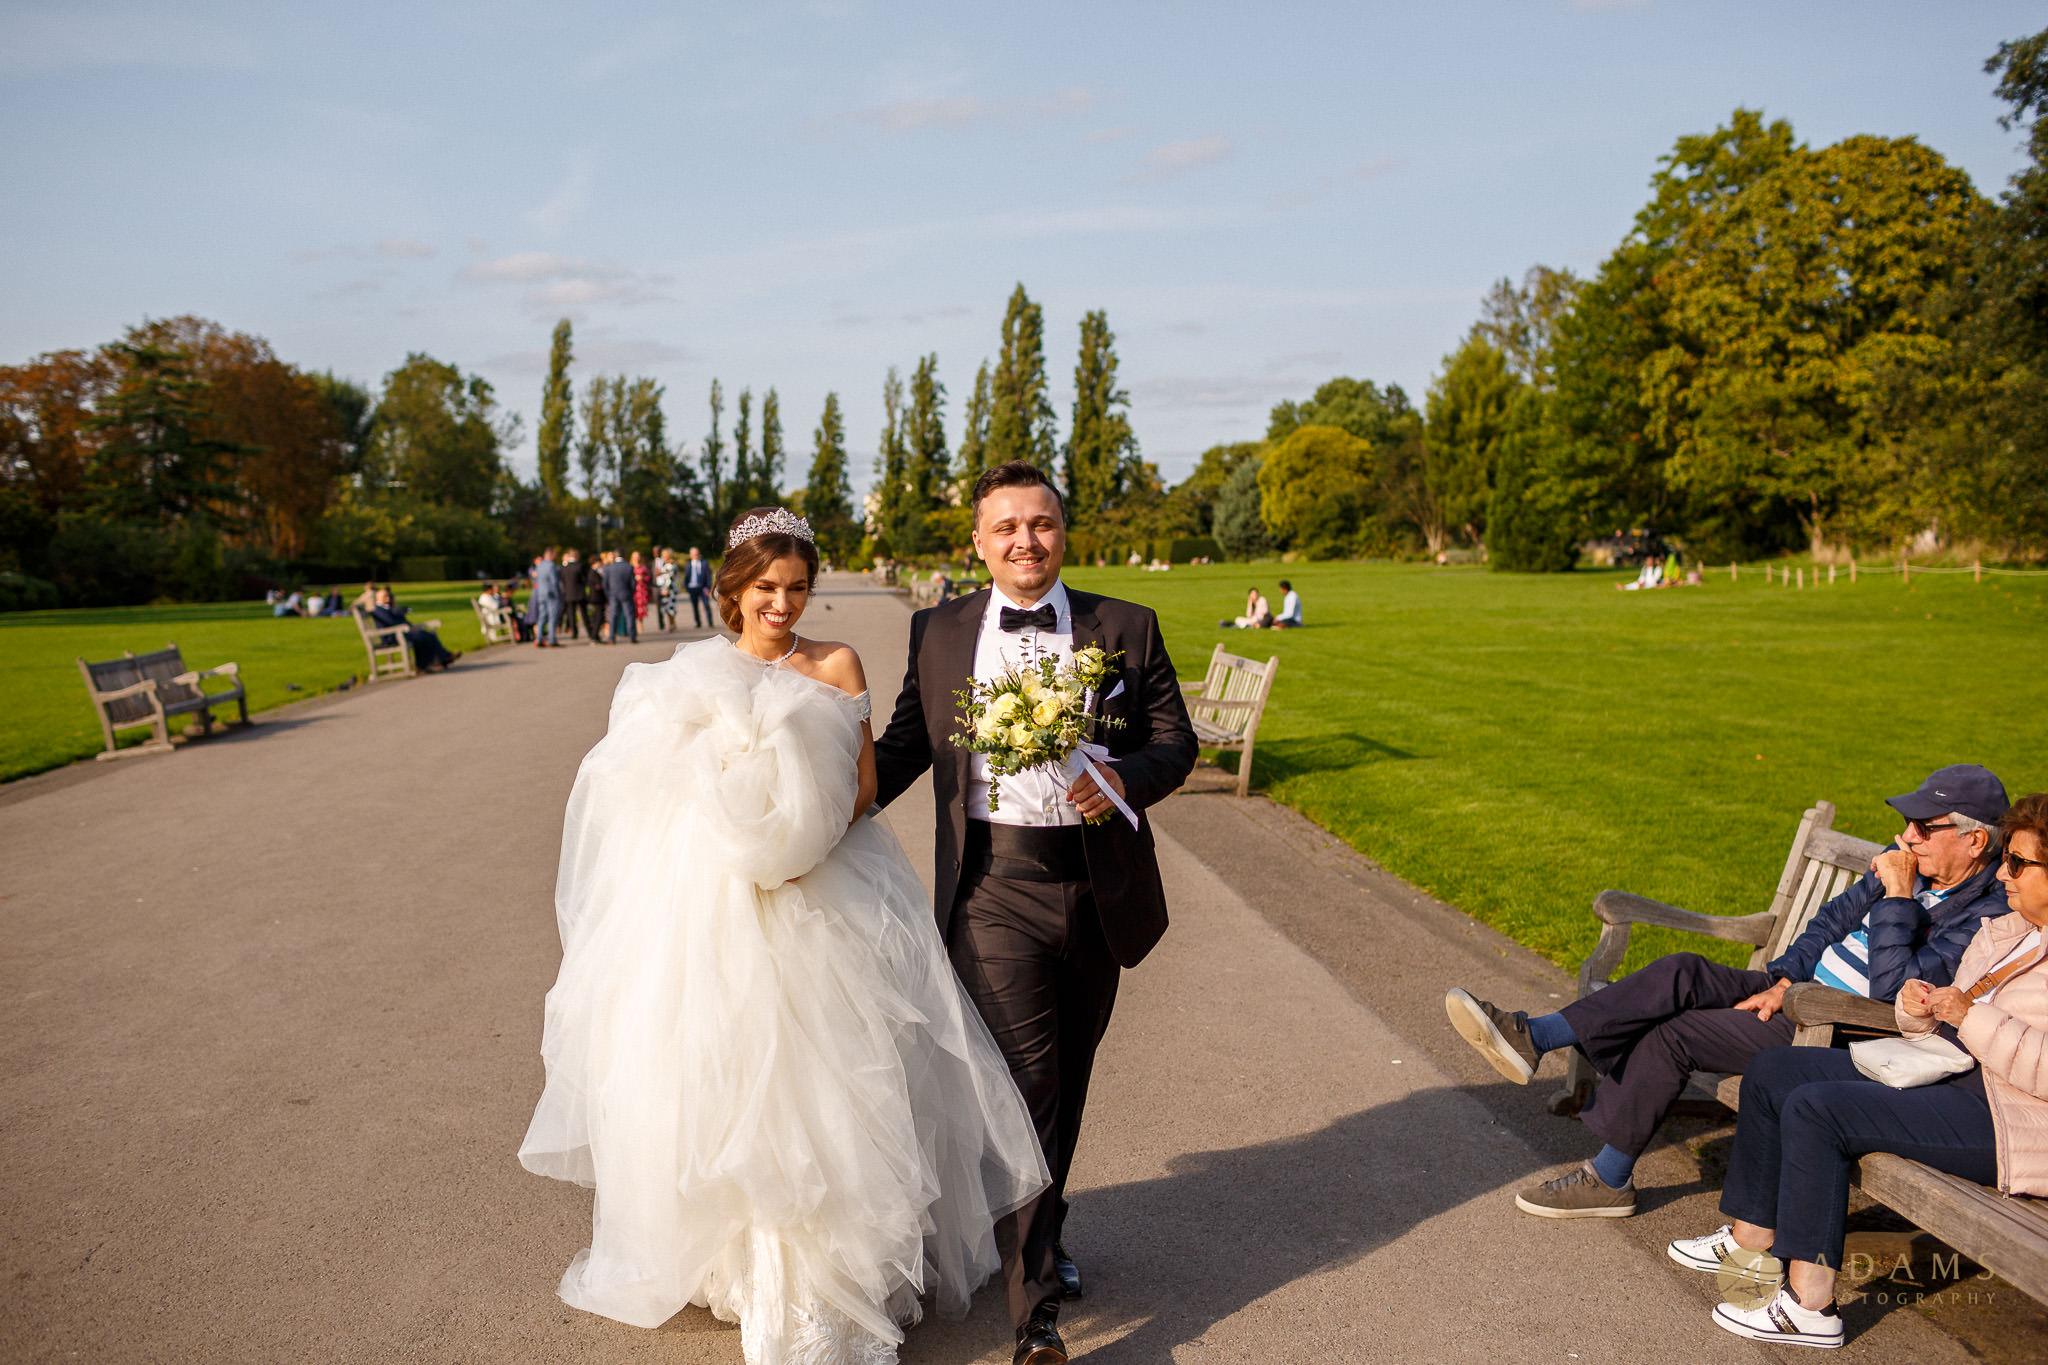 Bride and groom walking smiling